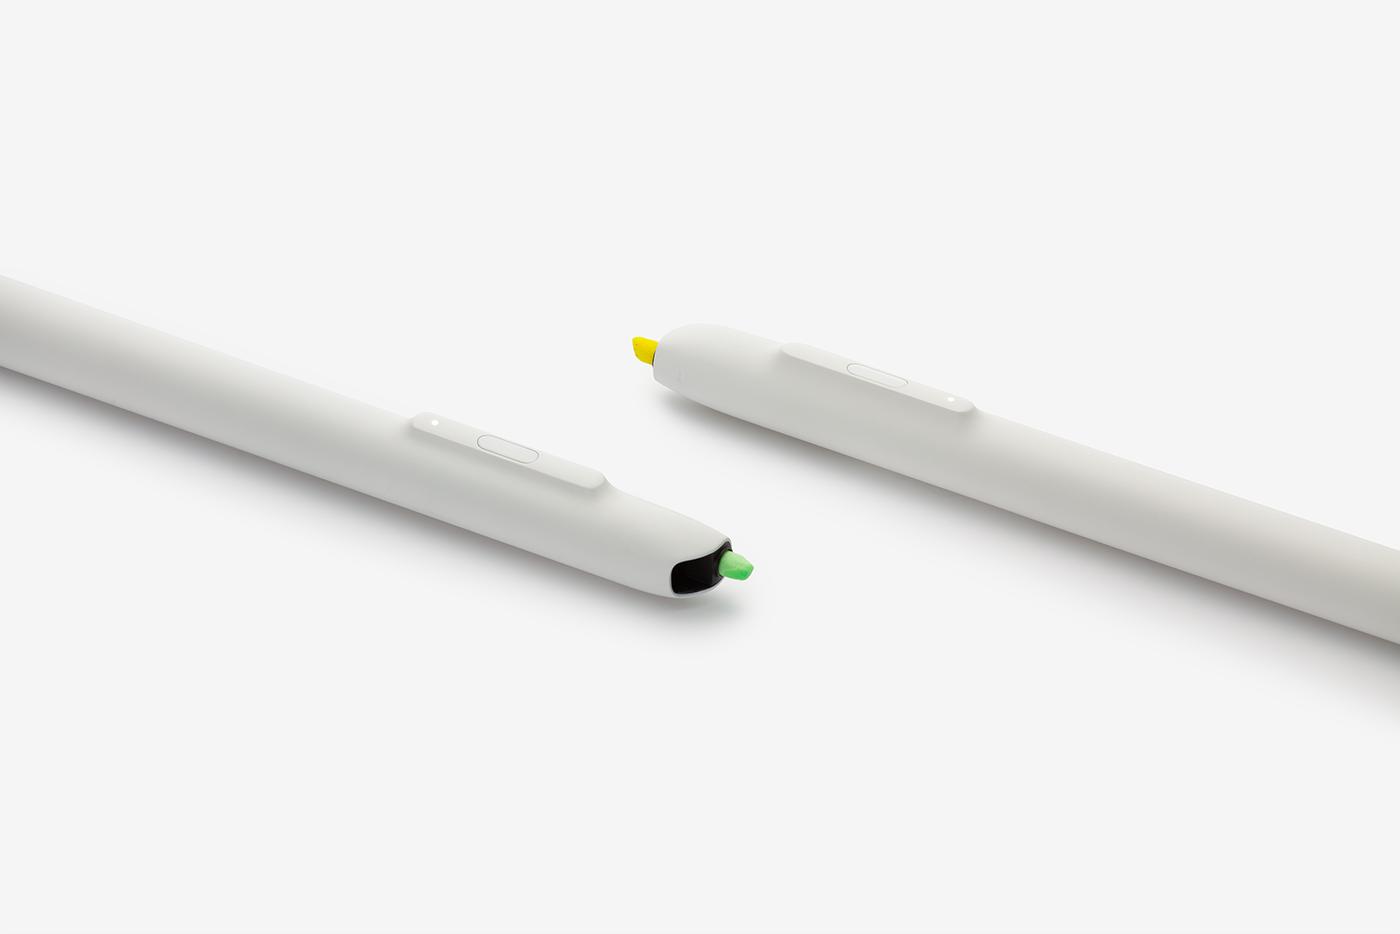 Hyler Smart pen highlighter scrap bkid product industrial design